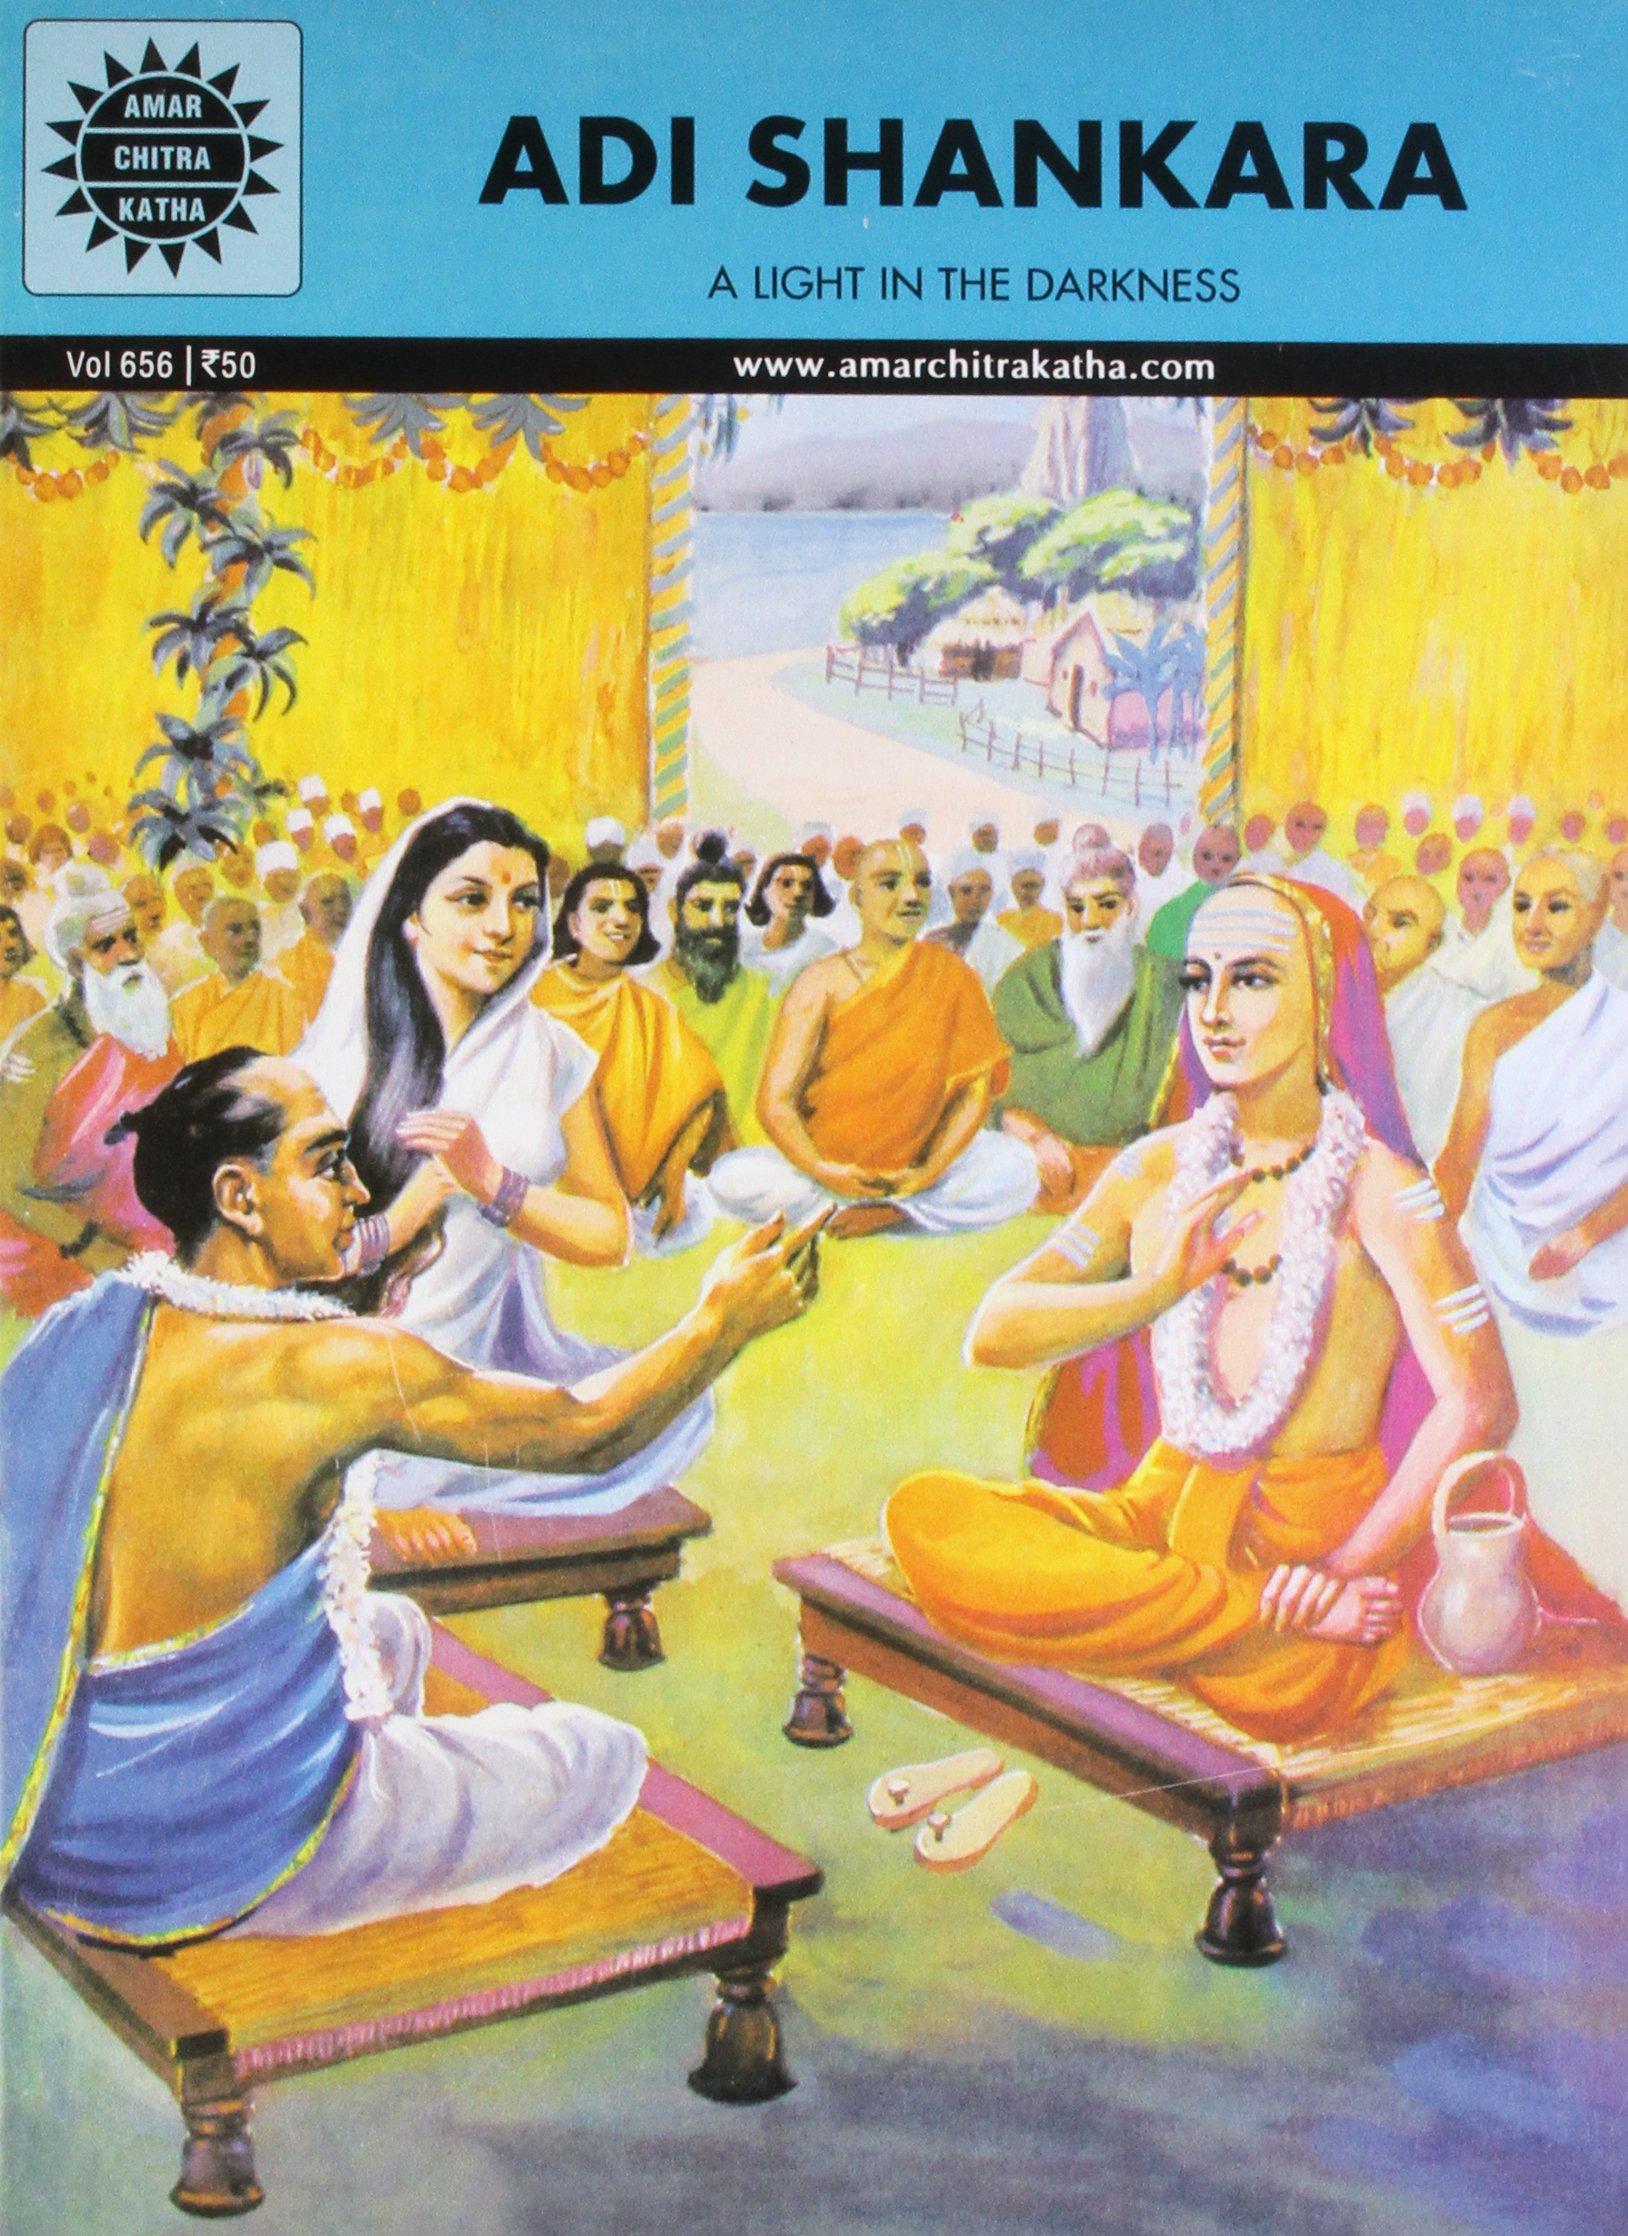 Krishna (retold from the bhagawat puran) amar chitra katha: anant.